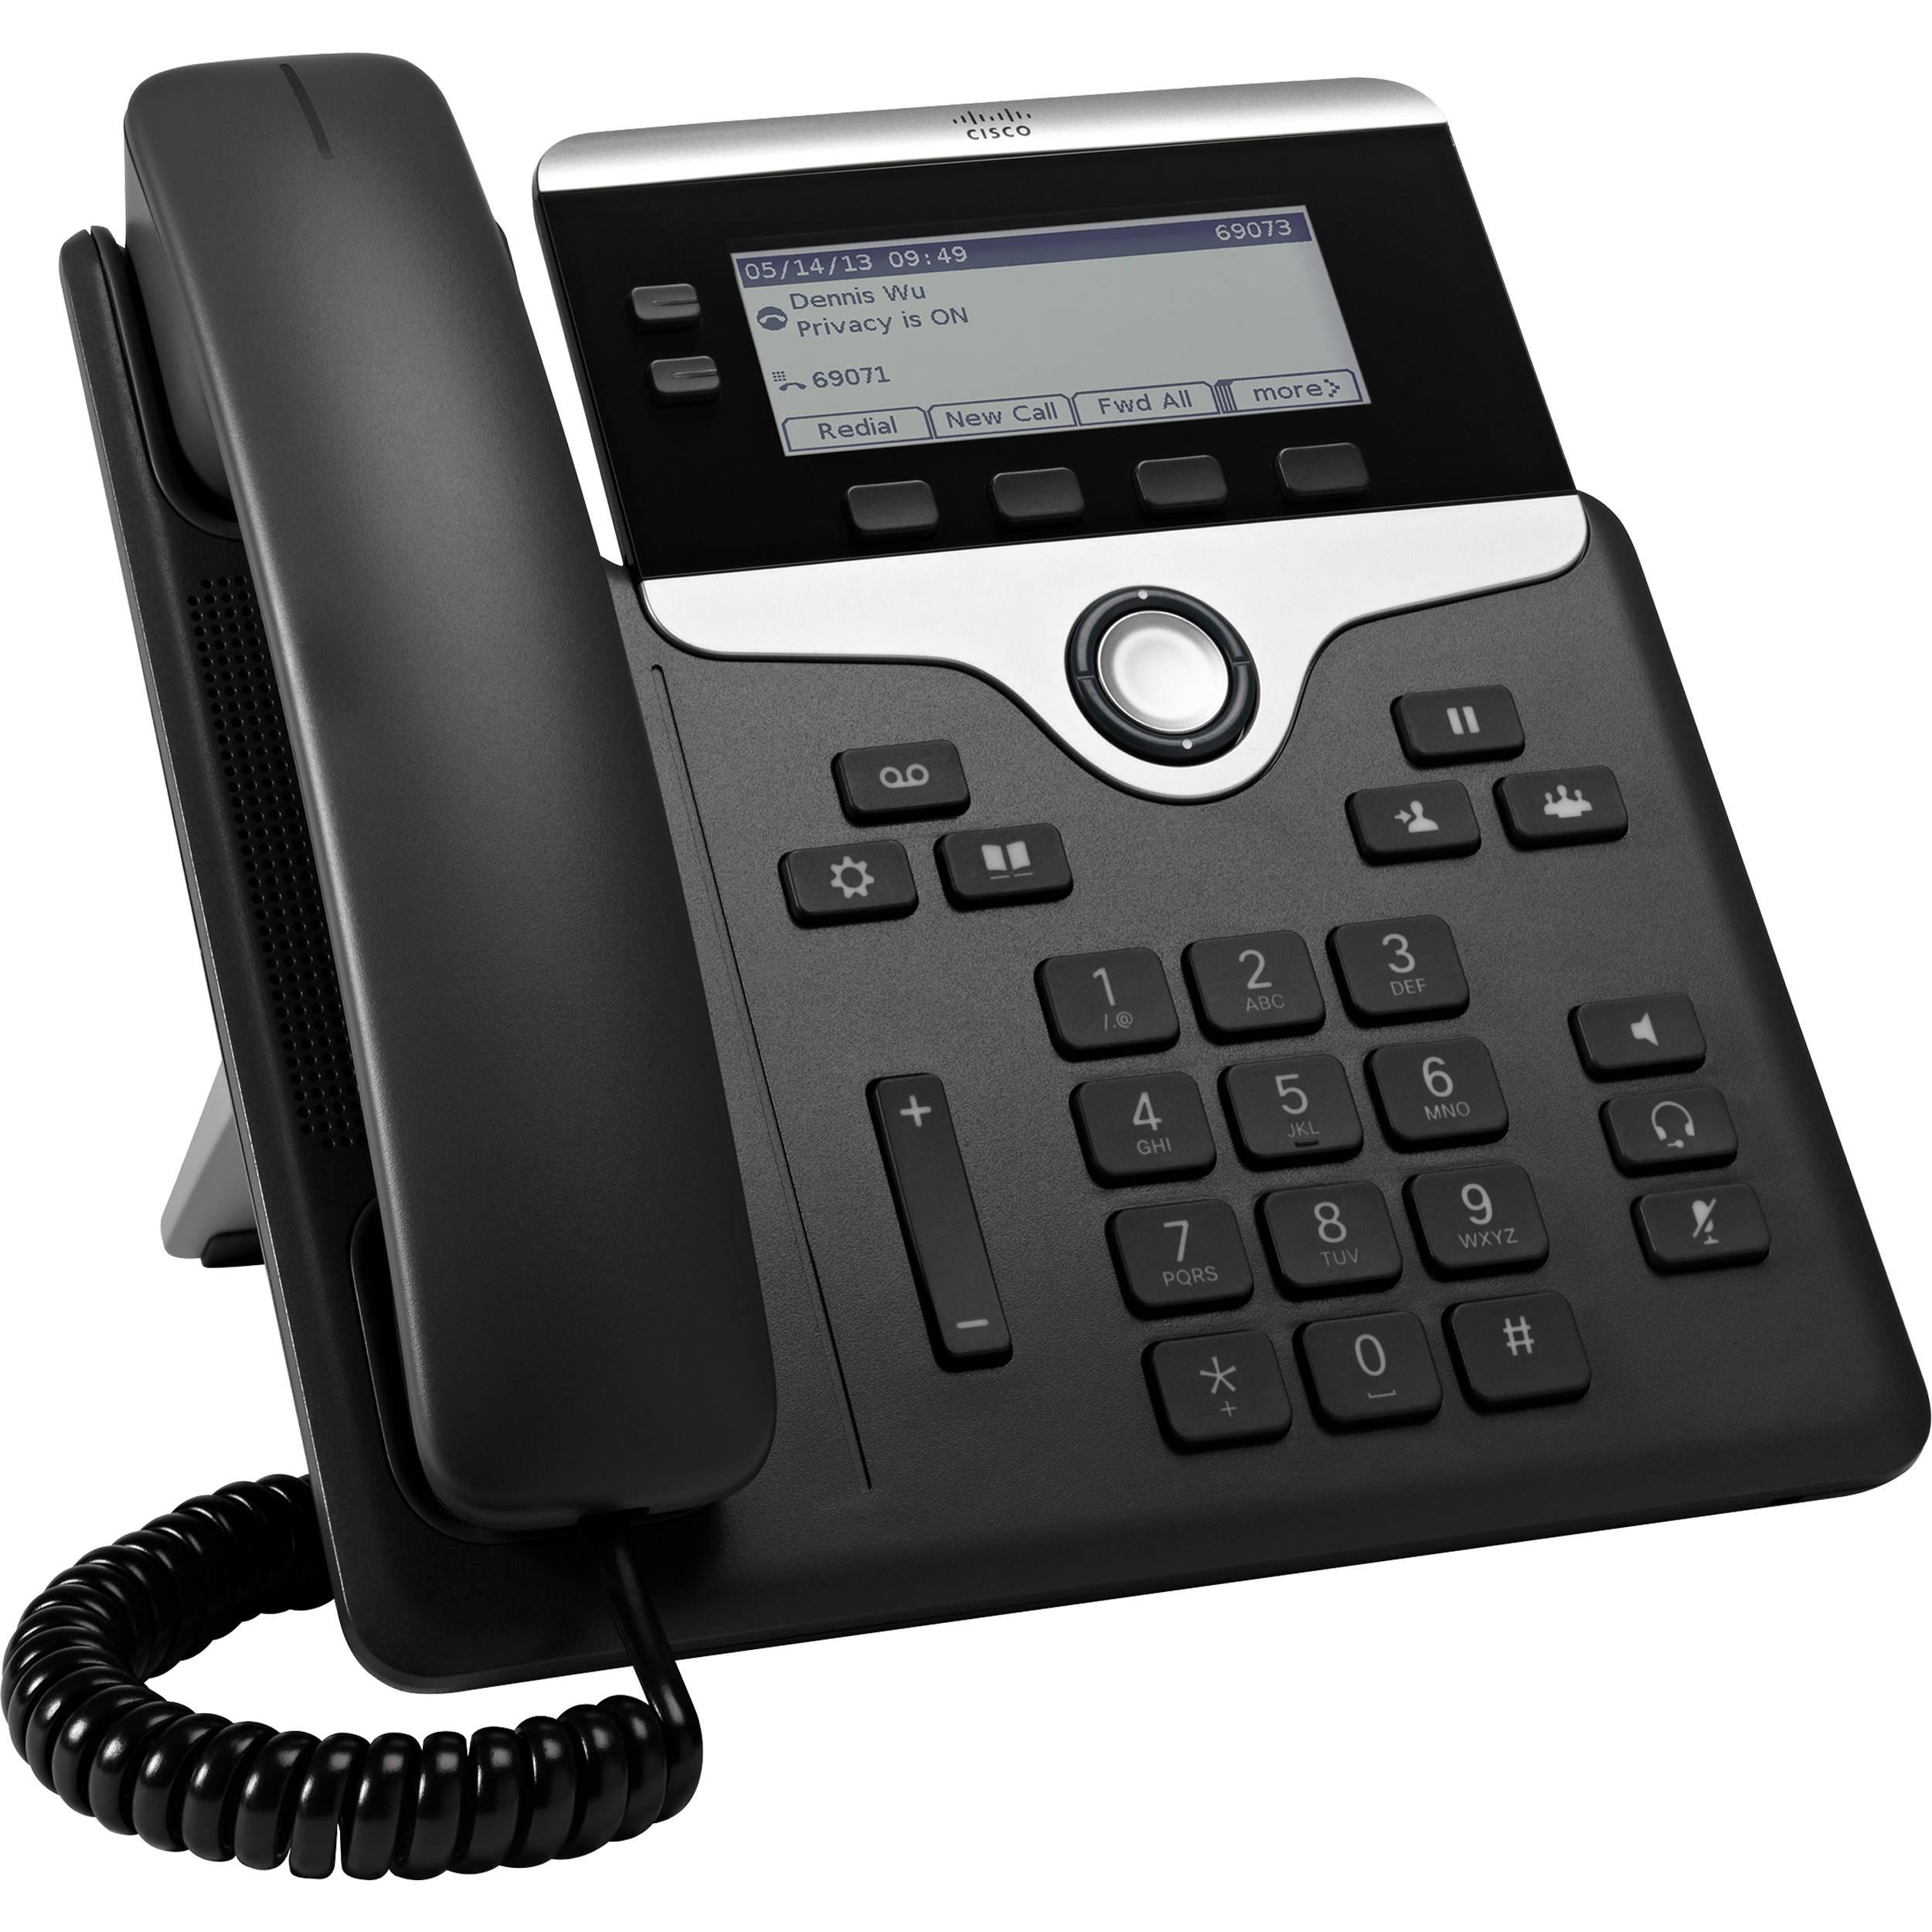 Cisco 7821 IP Phone Treiber Windows 10